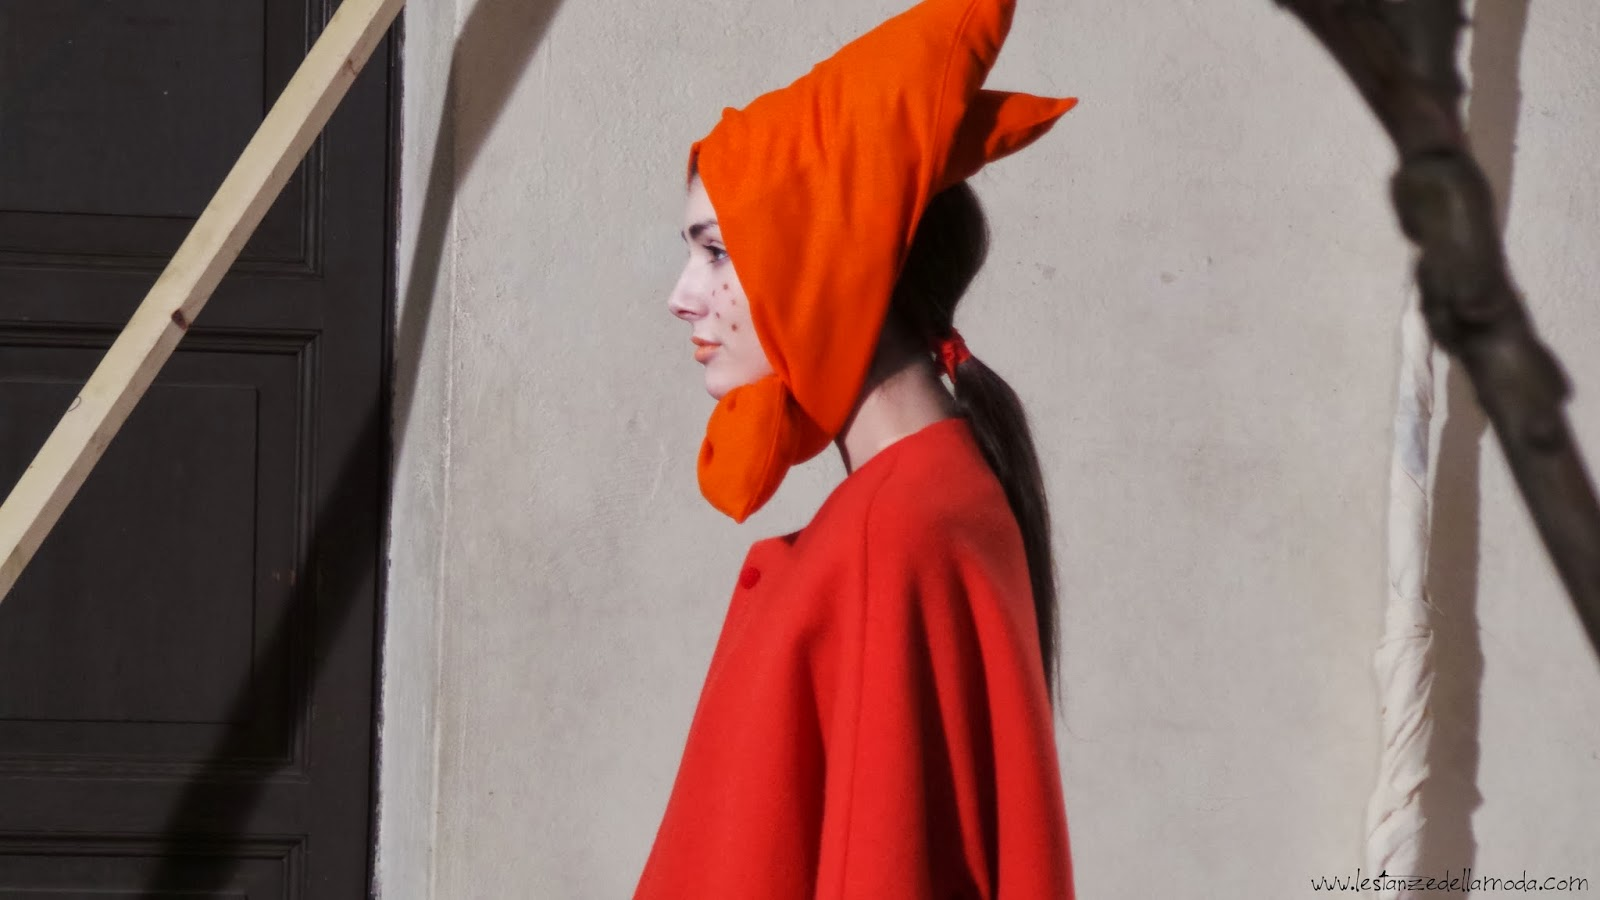 daniela gregis, autunno inverno 2014/2015, milano fashion week